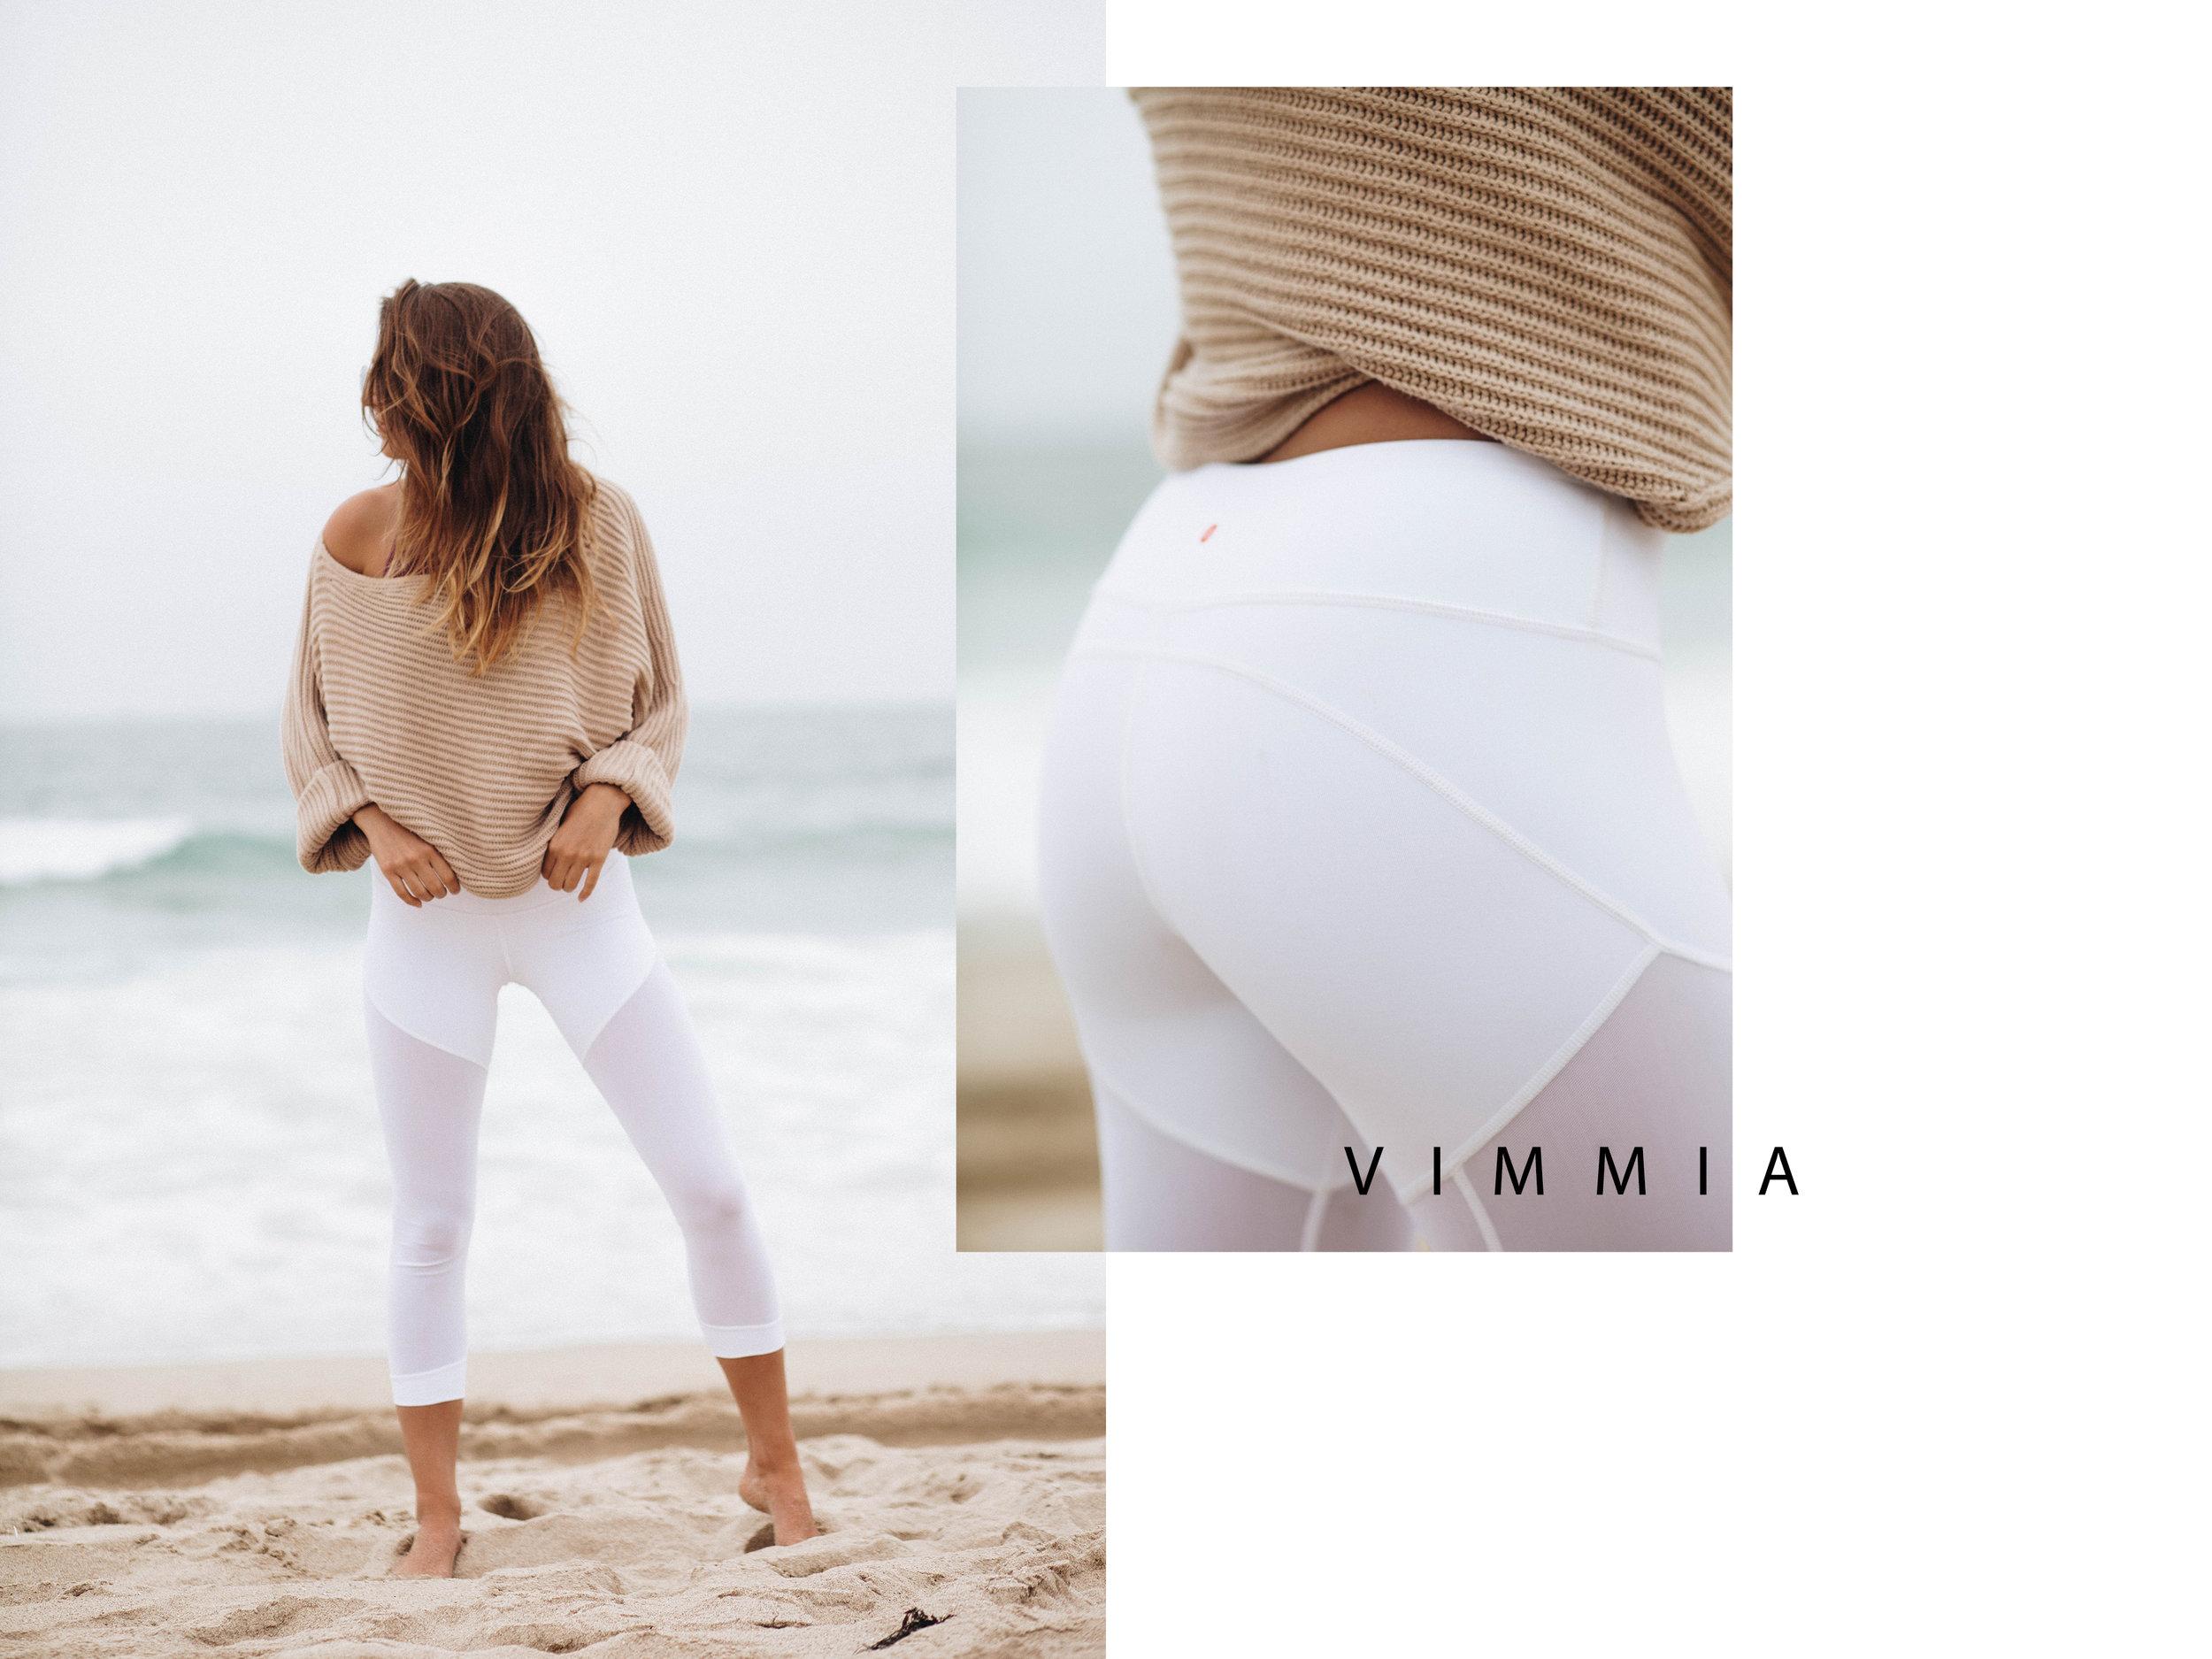 c417c73f3e549 Vimmia - Bold Capri — The Athleisurely Life